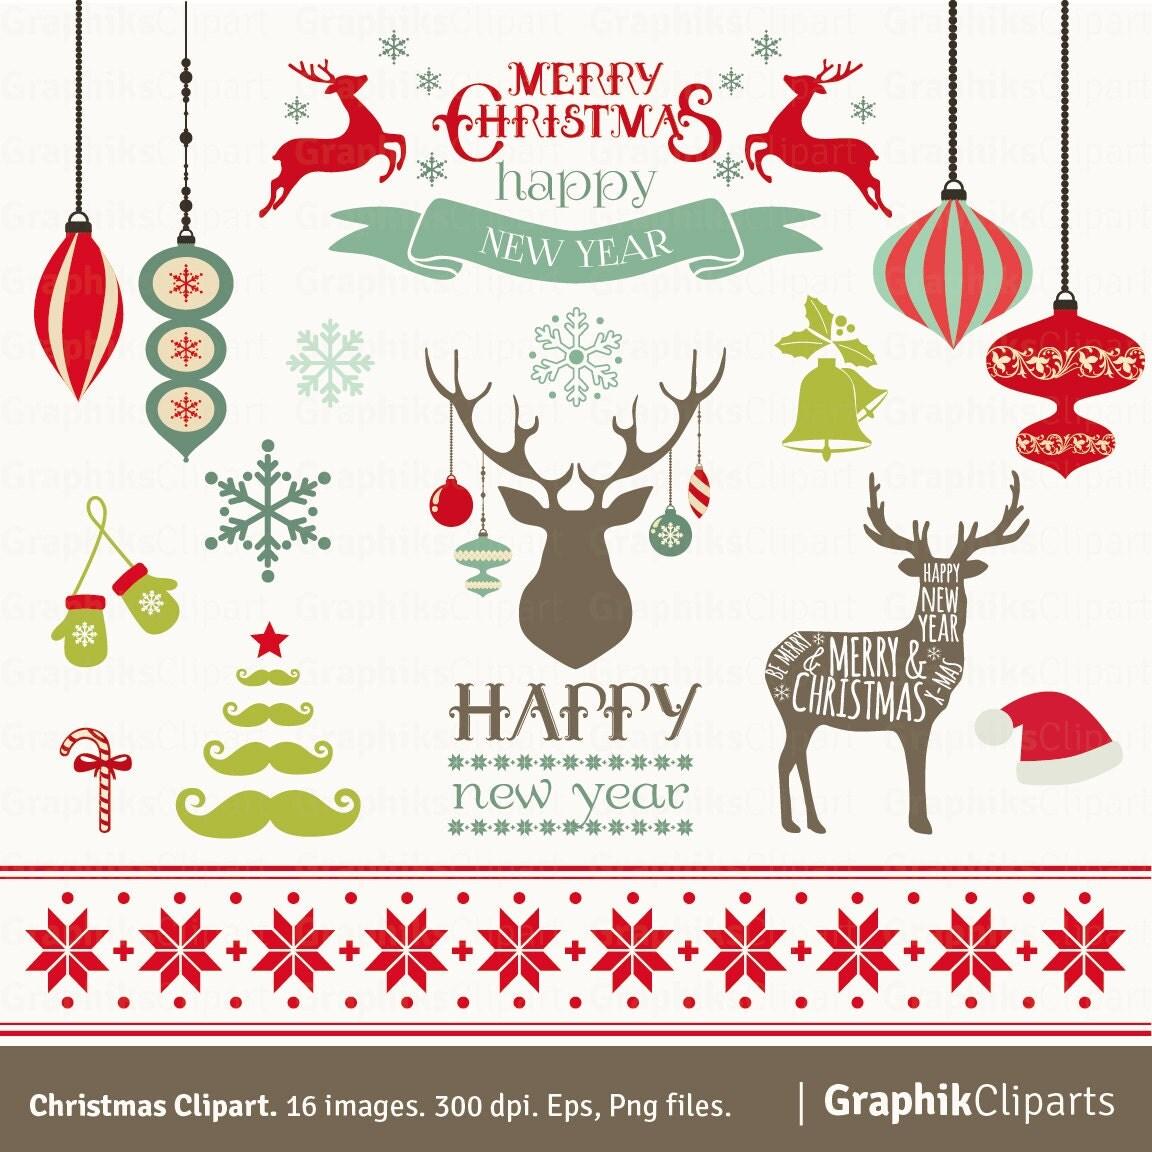 christmas clipart etsy - photo #16